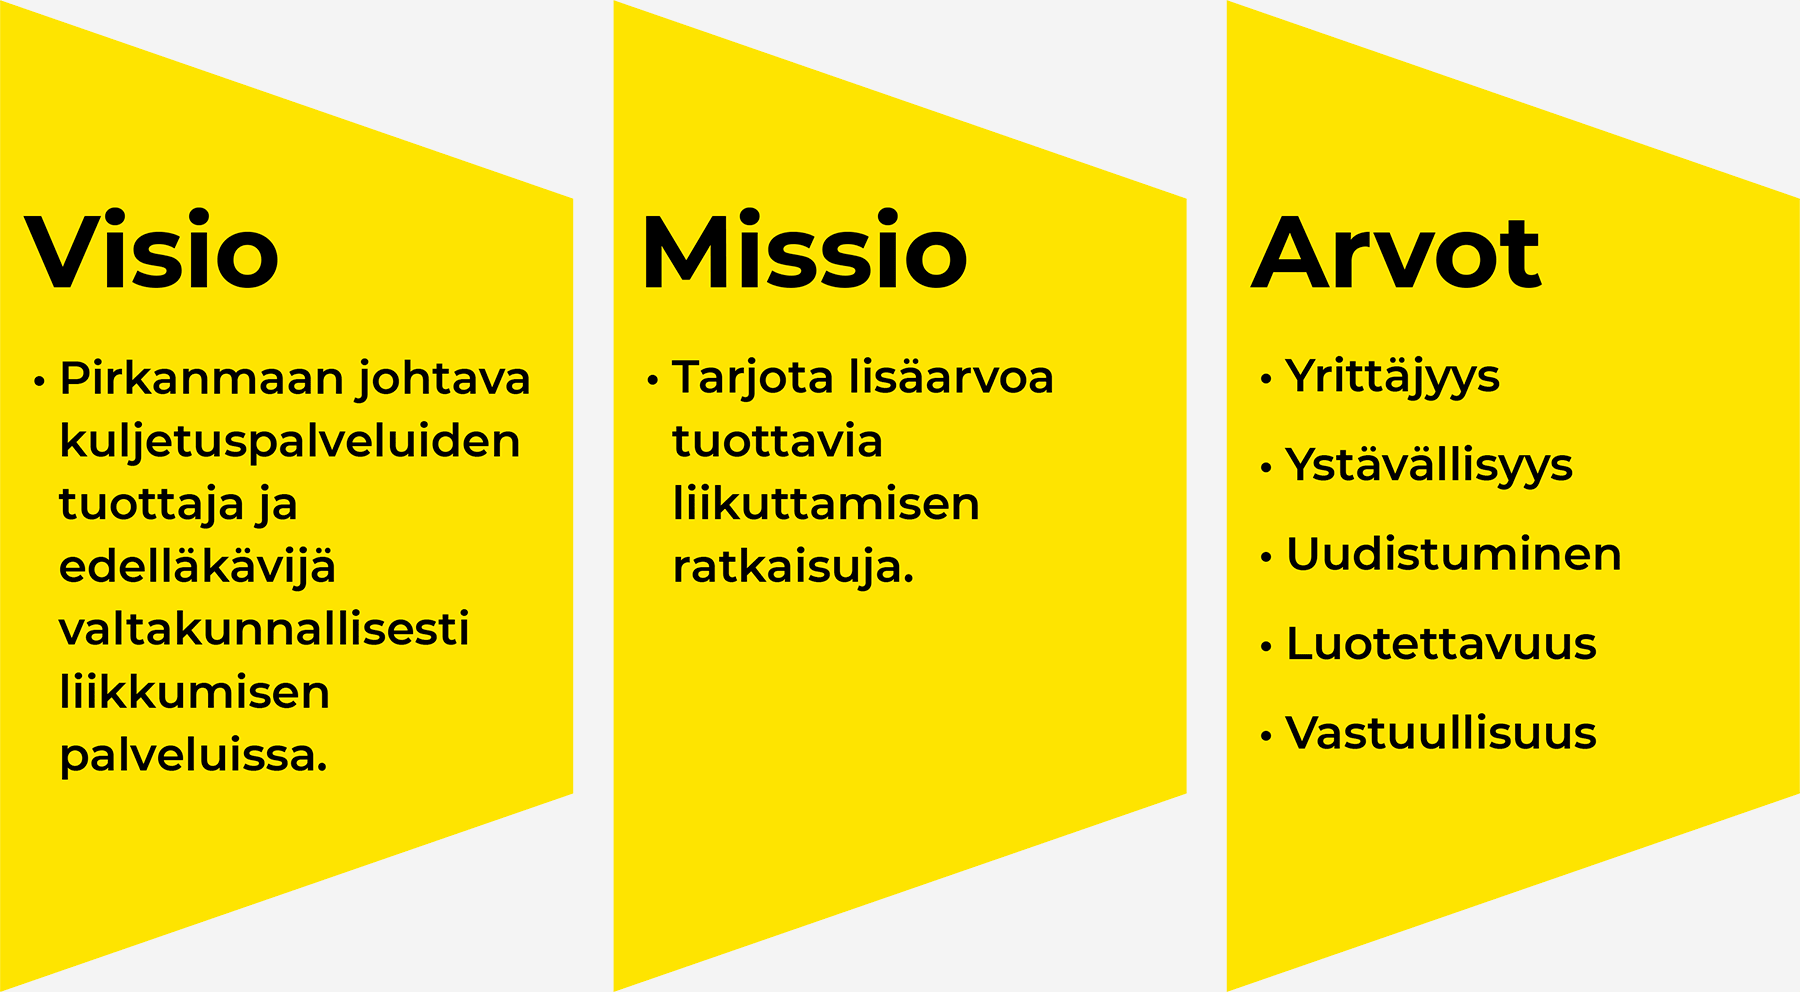 Tampereen Aluetaksin visio, missio ja arvot.